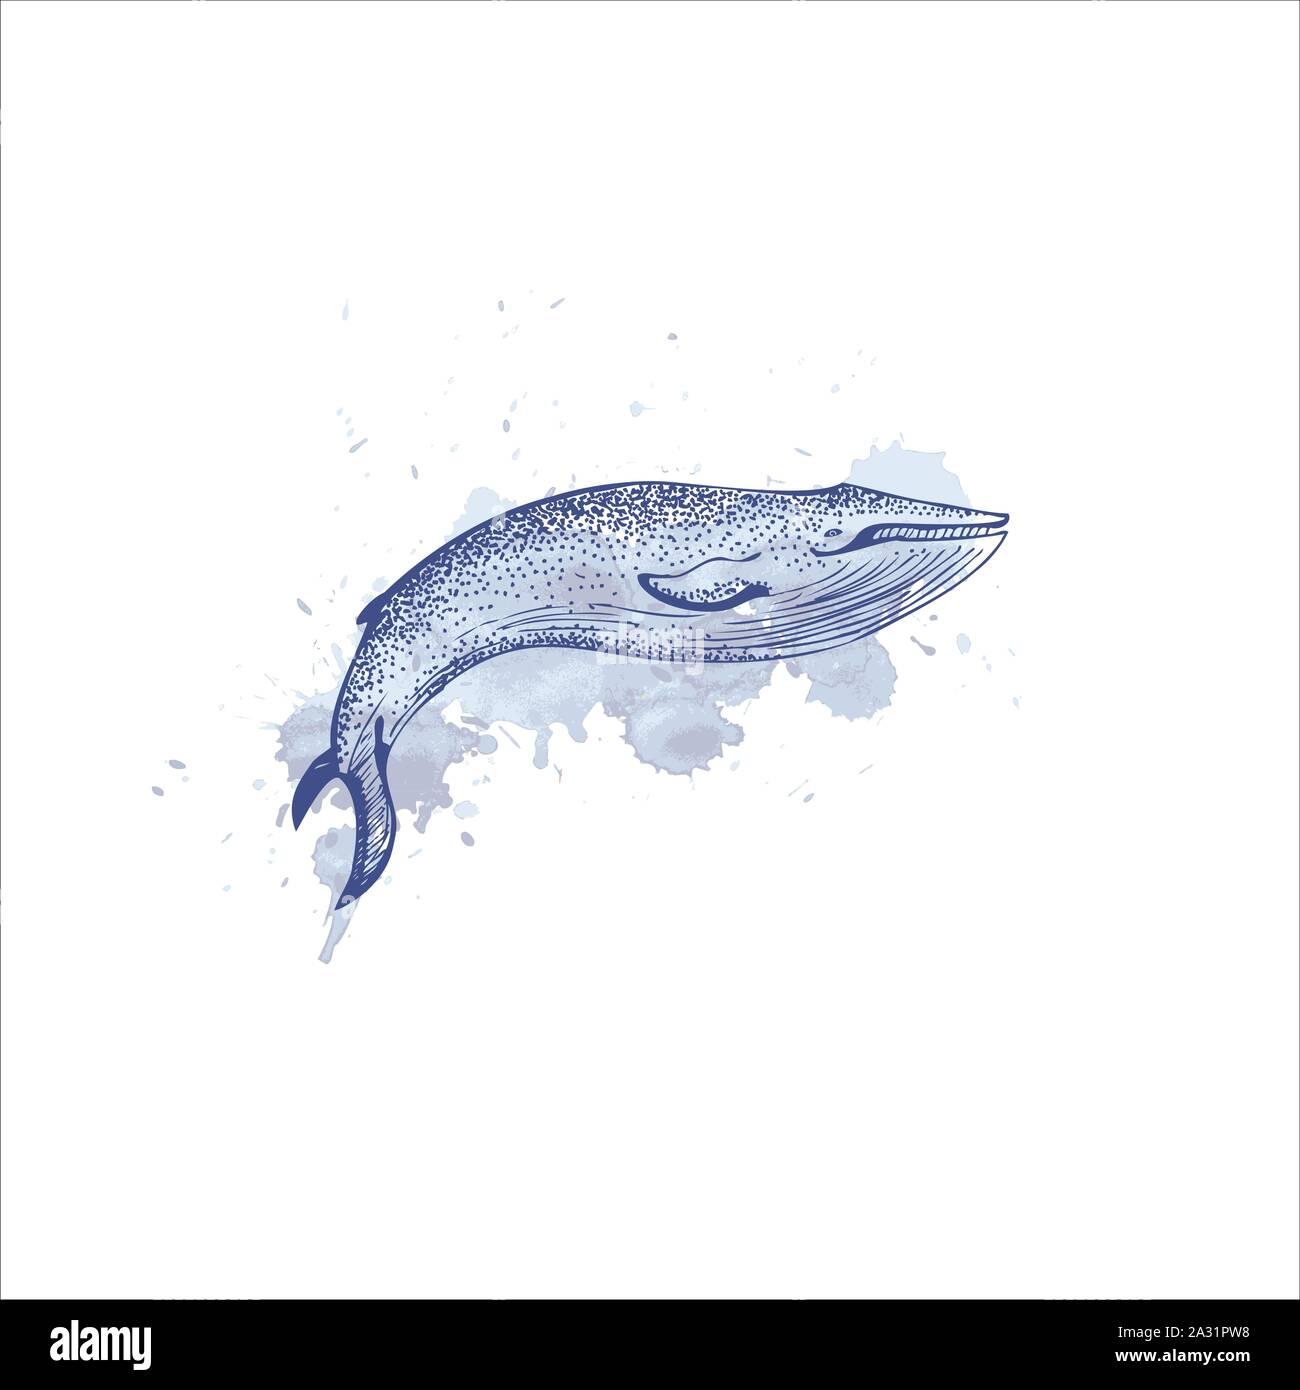 Black And White Hand Drawn Illustration Vector Art Blue Whale Illustration On Isolated White Background Endangered Marine Animal Concept Educational Wildlife Design Vector Stock Vector Image Art Alamy